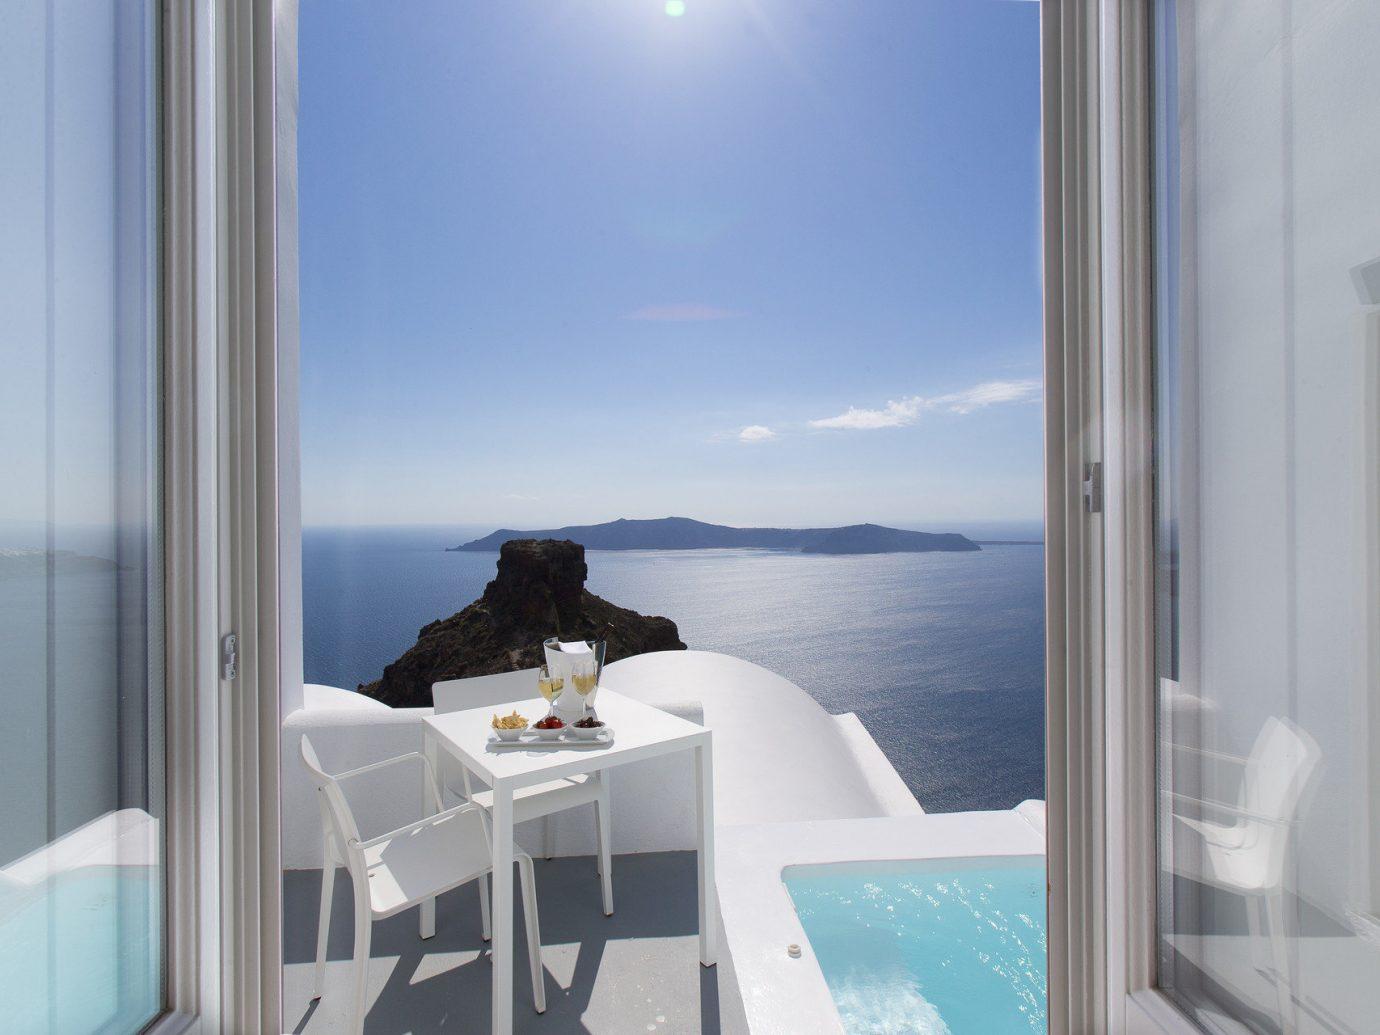 Hotels Romance window room property house home condominium swimming pool yacht interior design white apartment